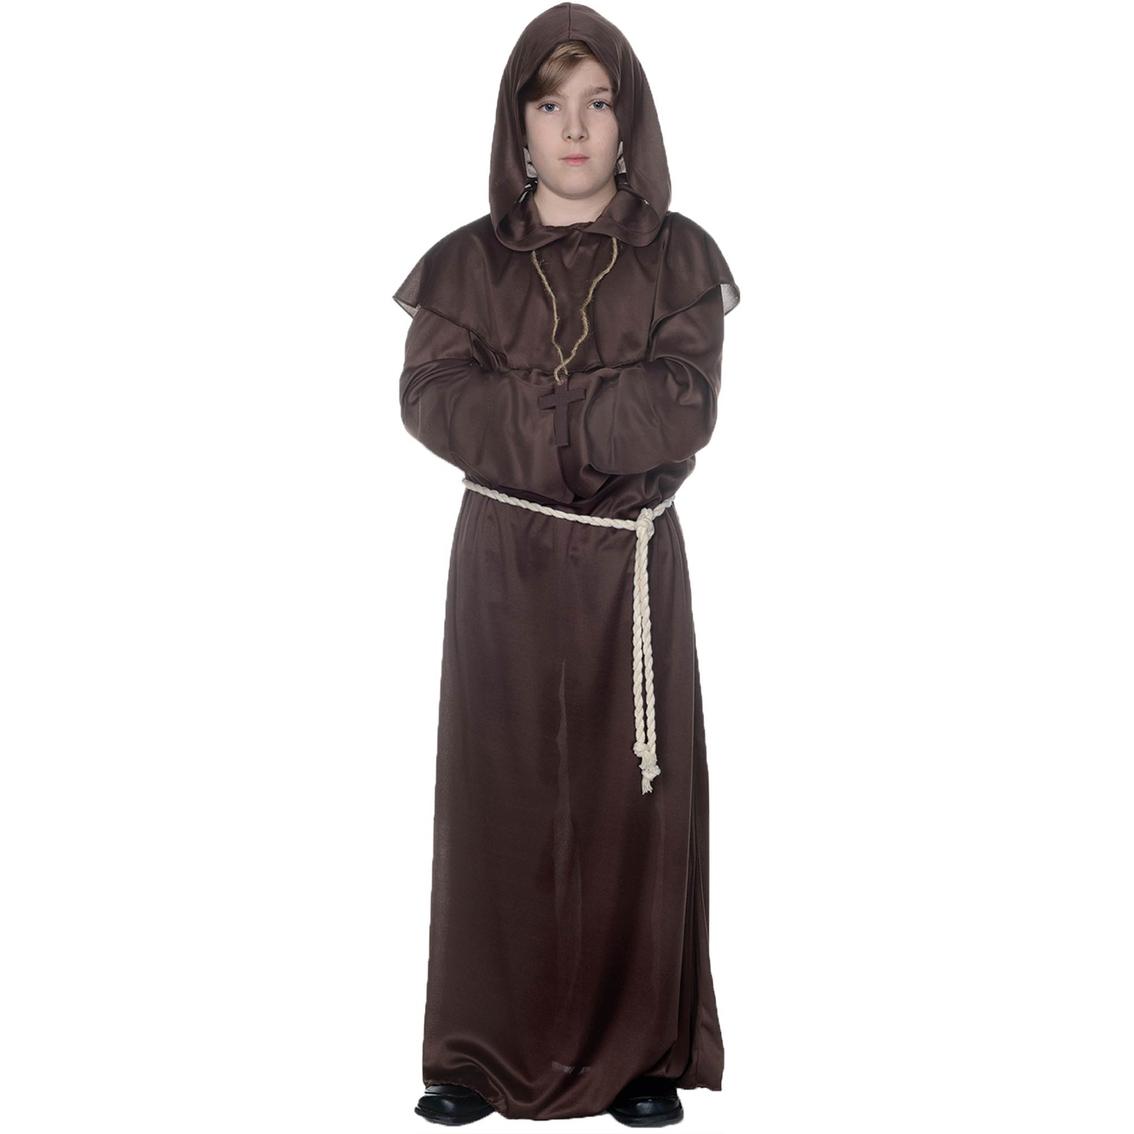 9201580cd254 Rasta Imposta Little Boys / Boys Brown Monk Robe Costume ...